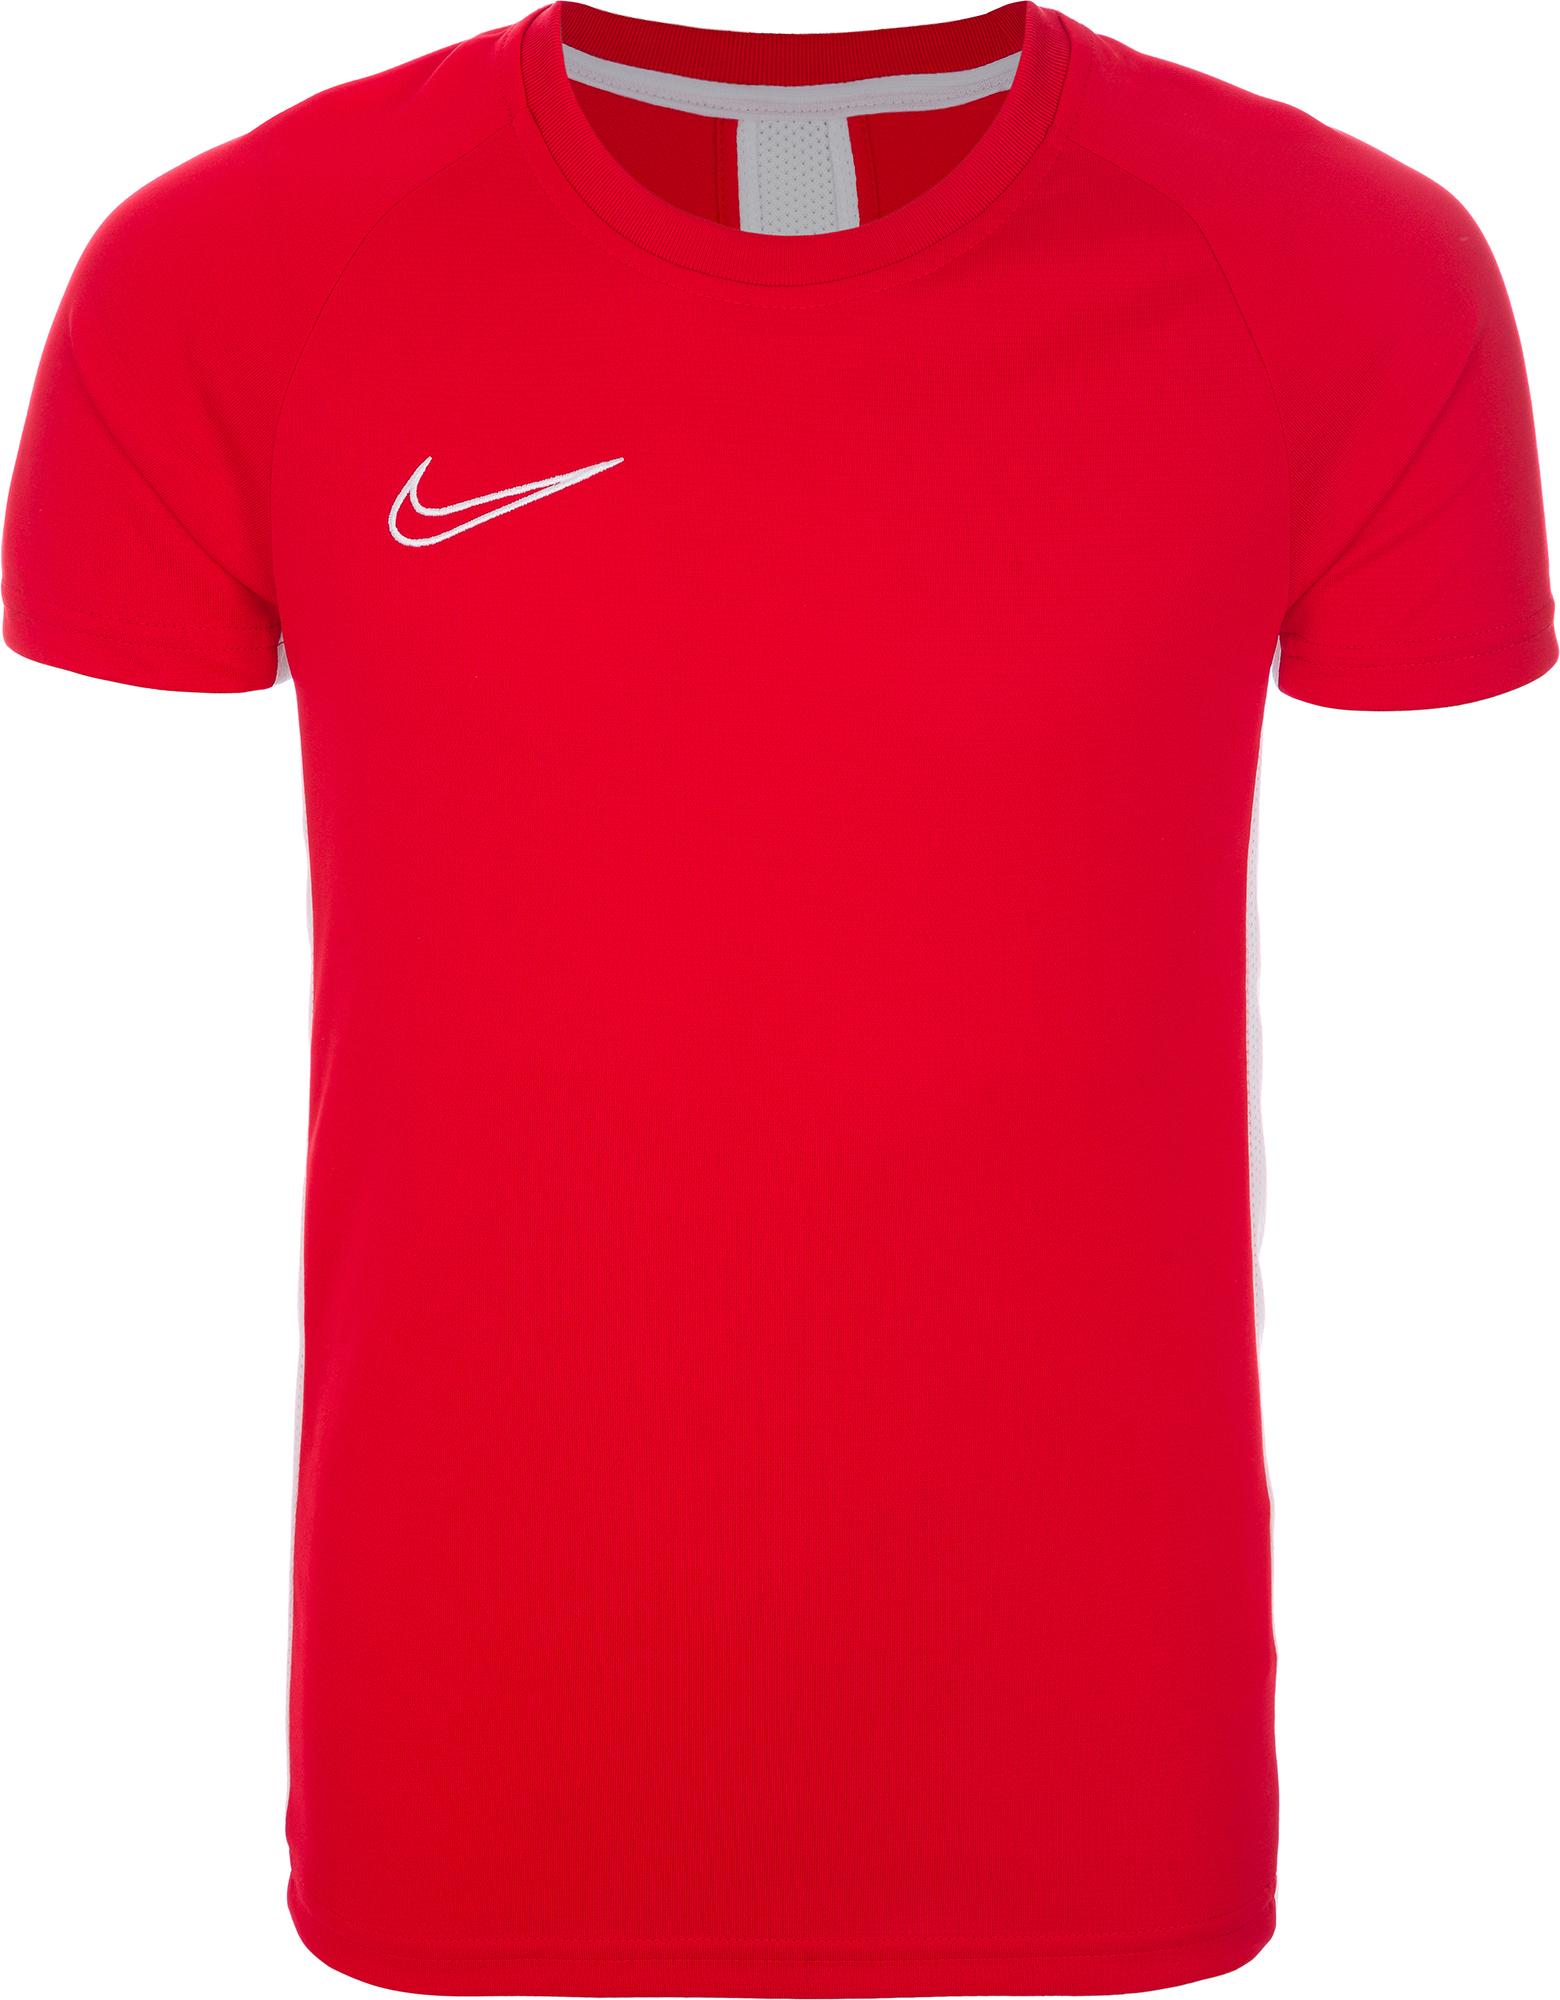 Nike Футболка для мальчиков Nike Academy, размер 158-170